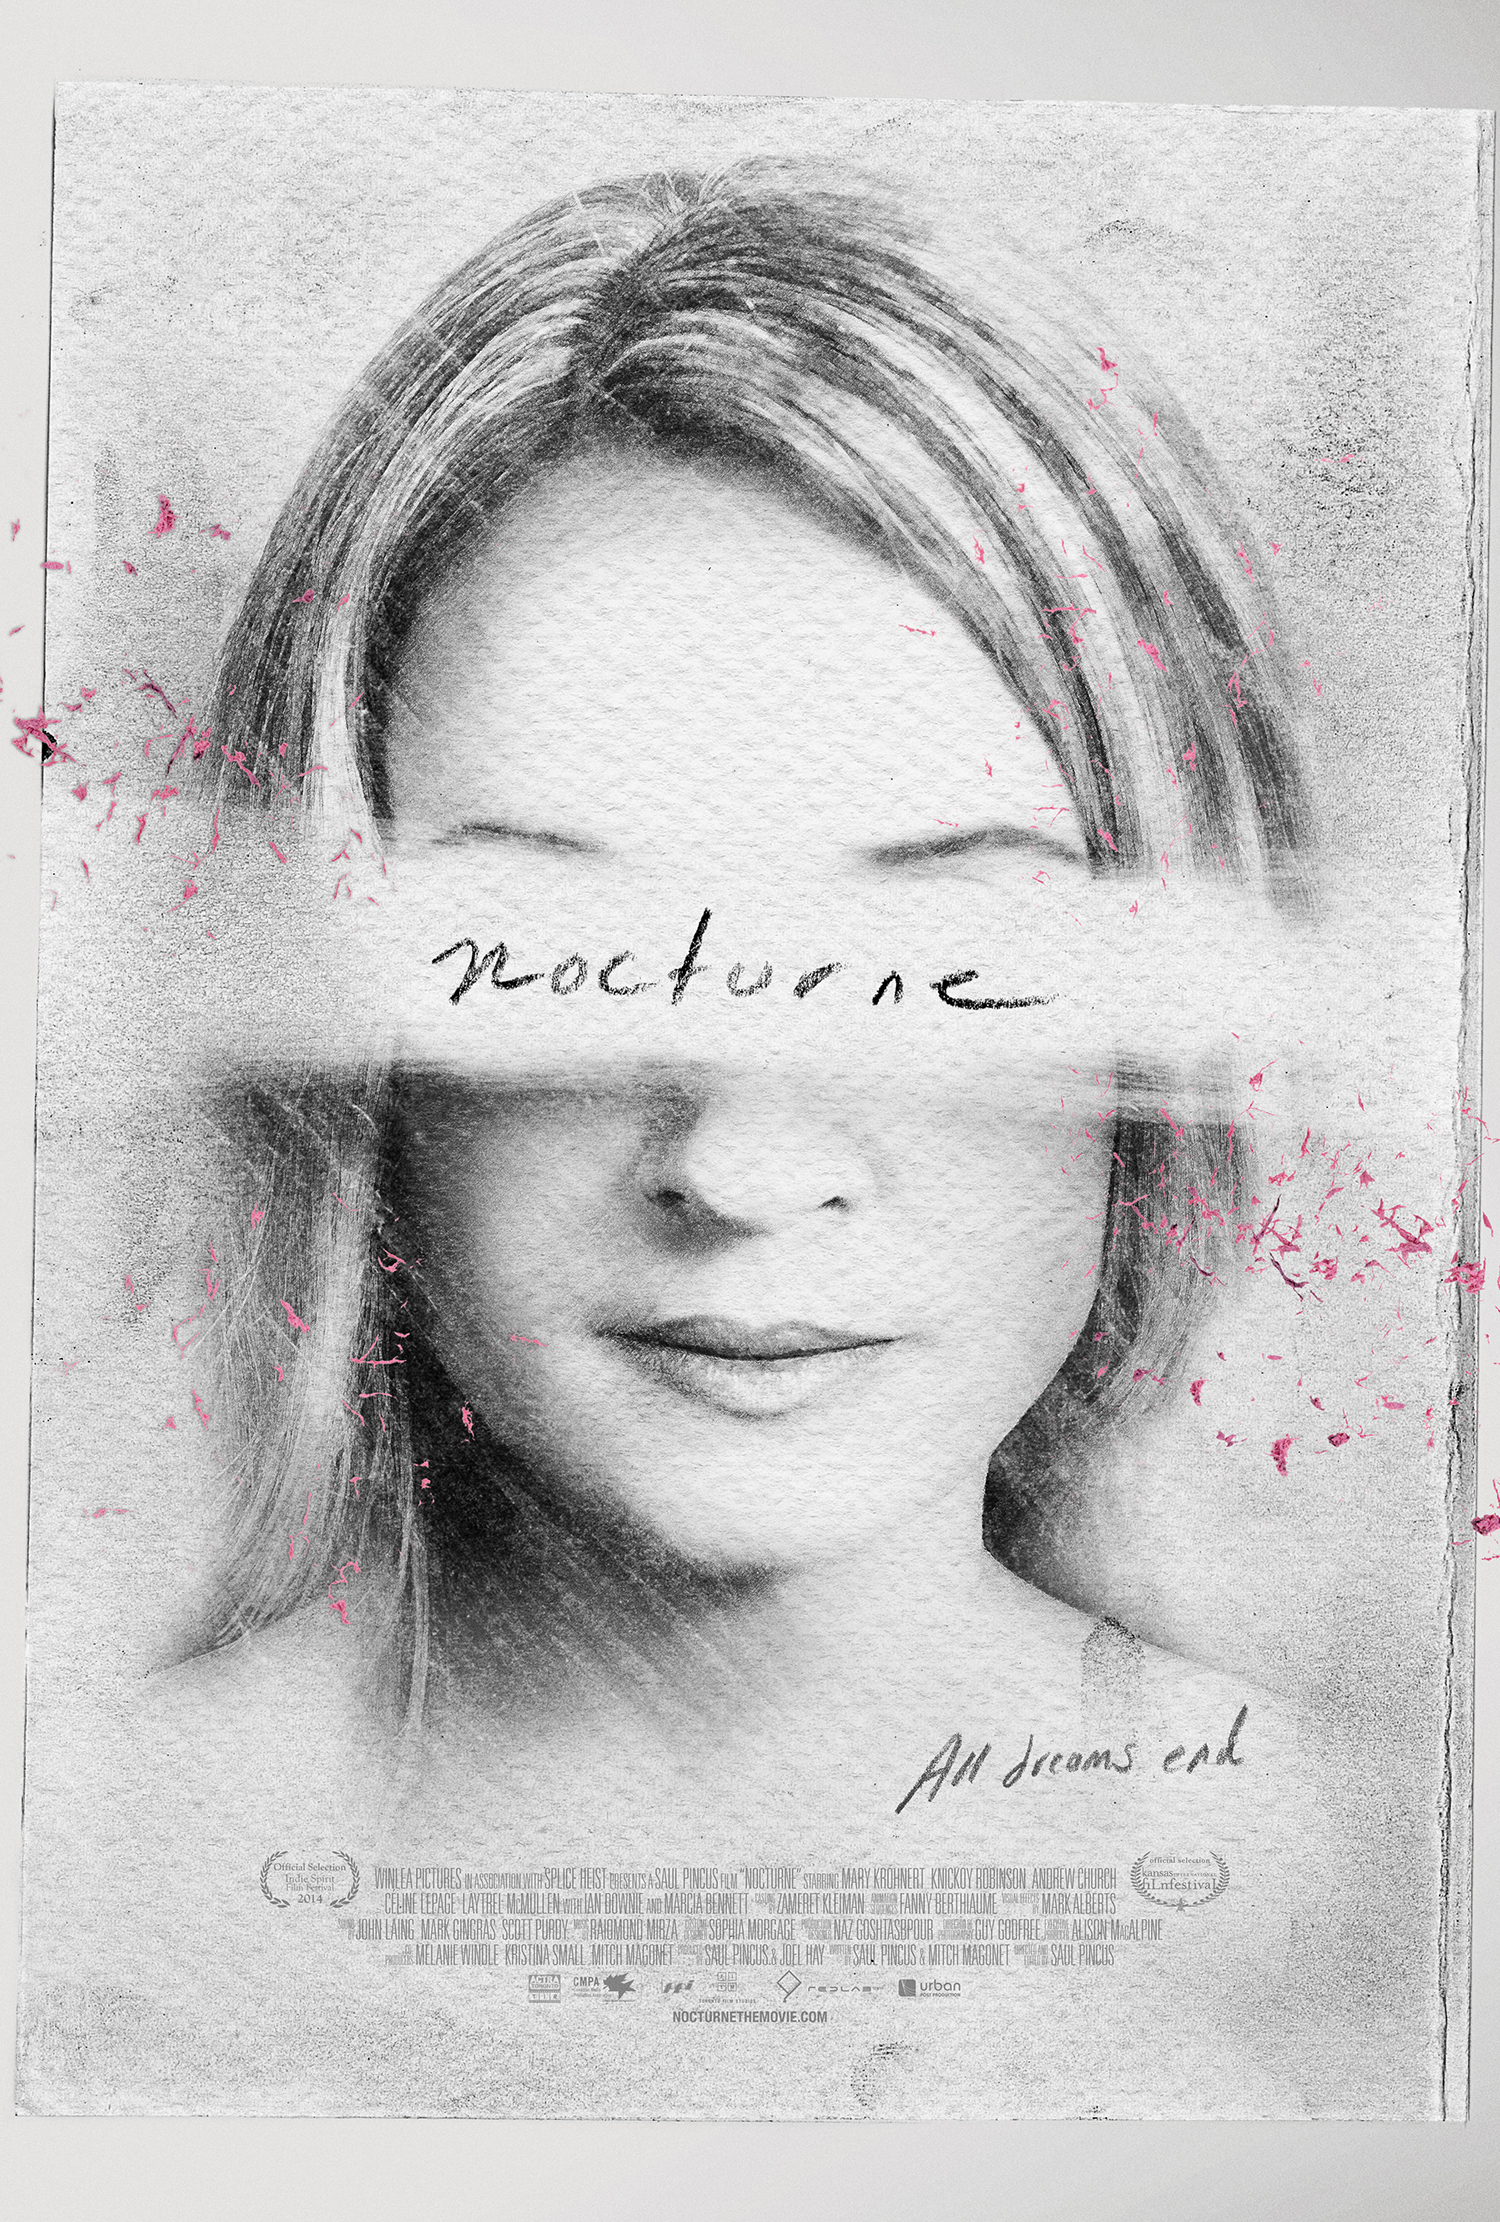 Nocturne_Vertical_Finish